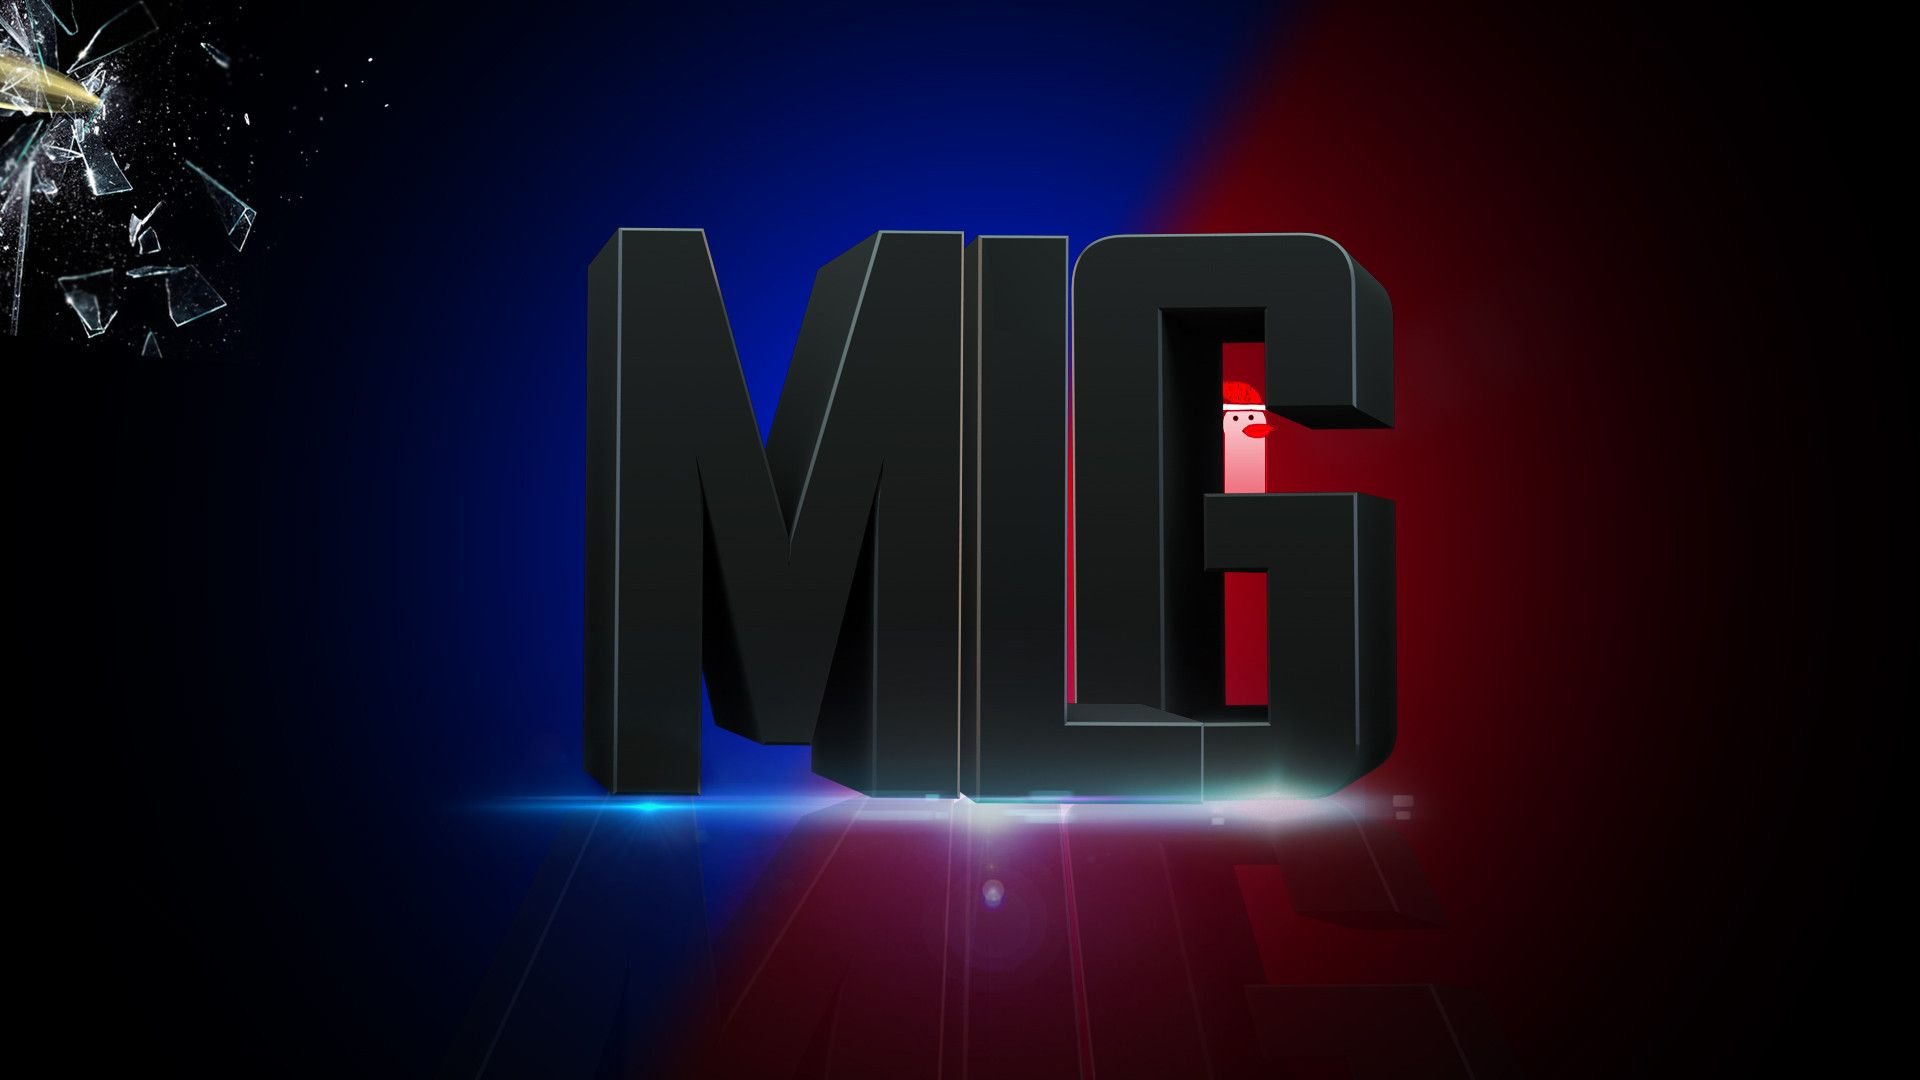 Free download mlg wallpaper [1920x1080